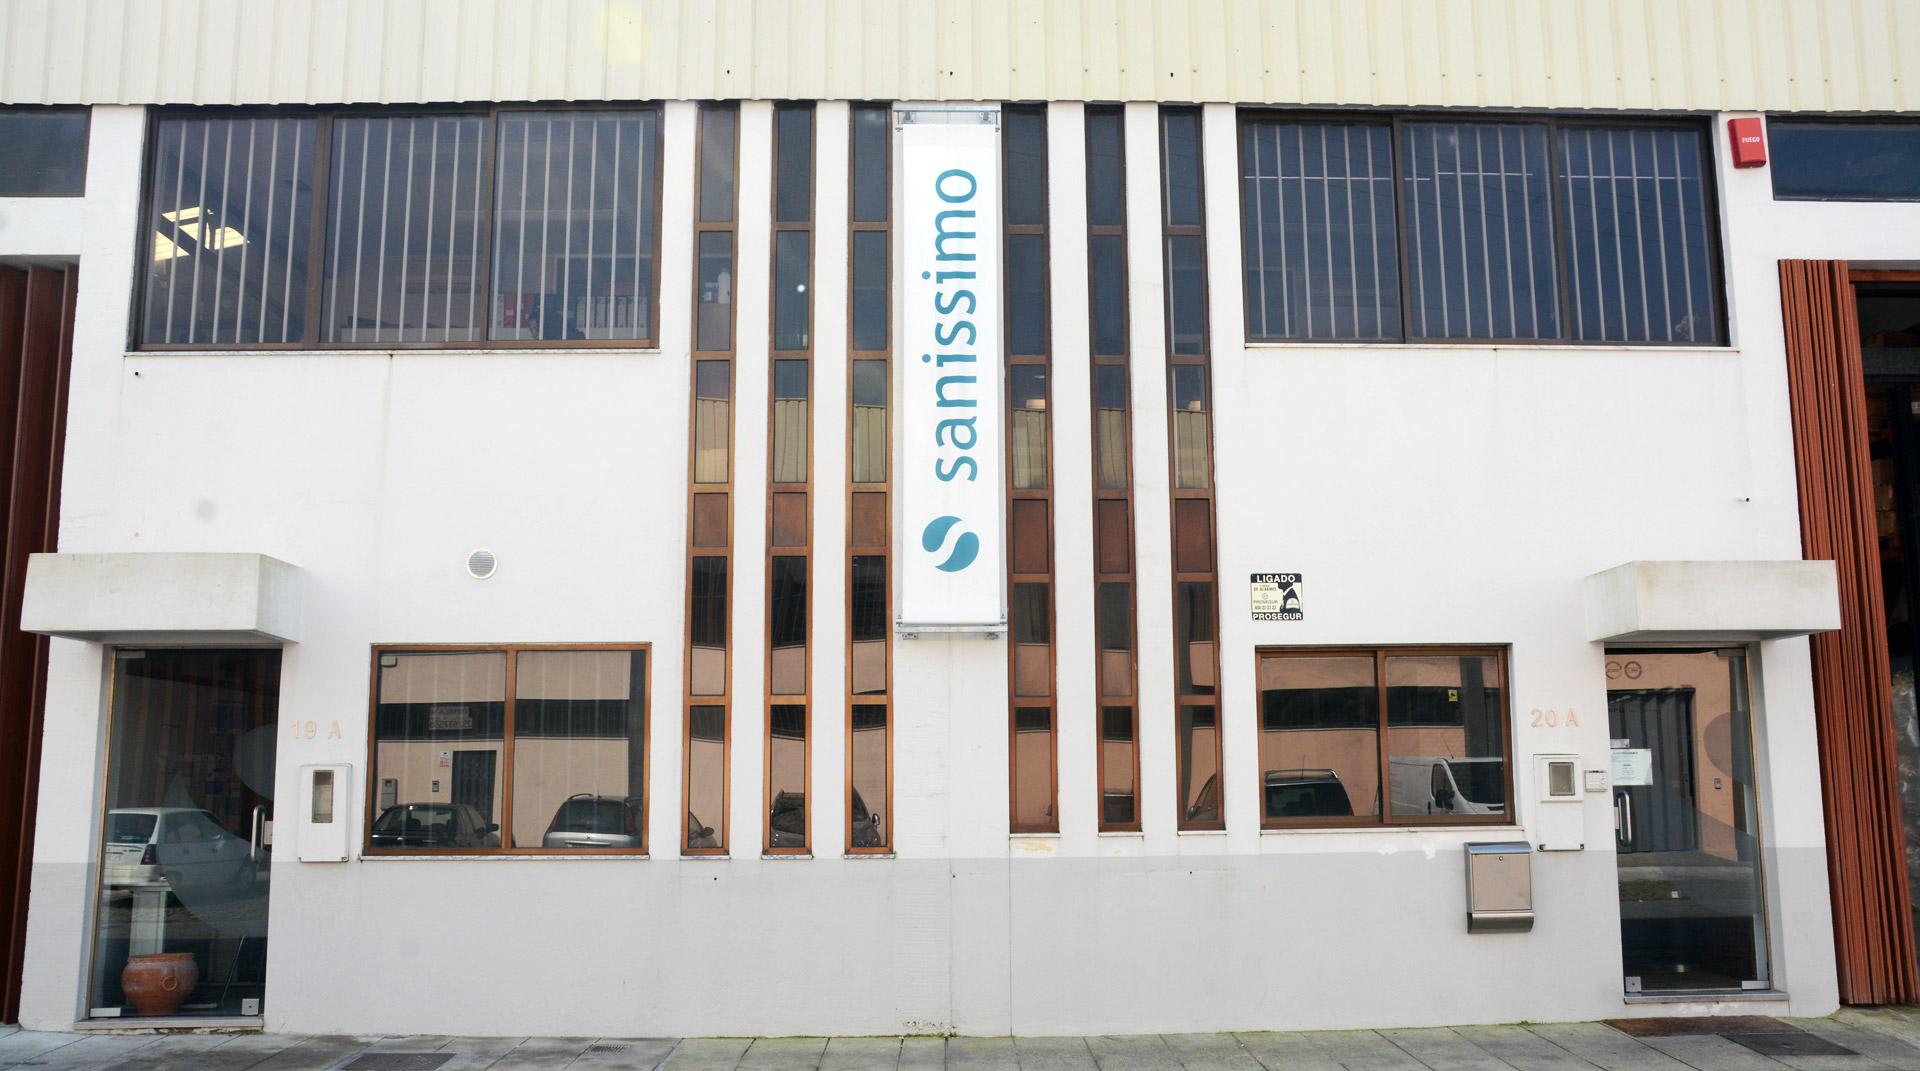 sanissimo_edificio_frente